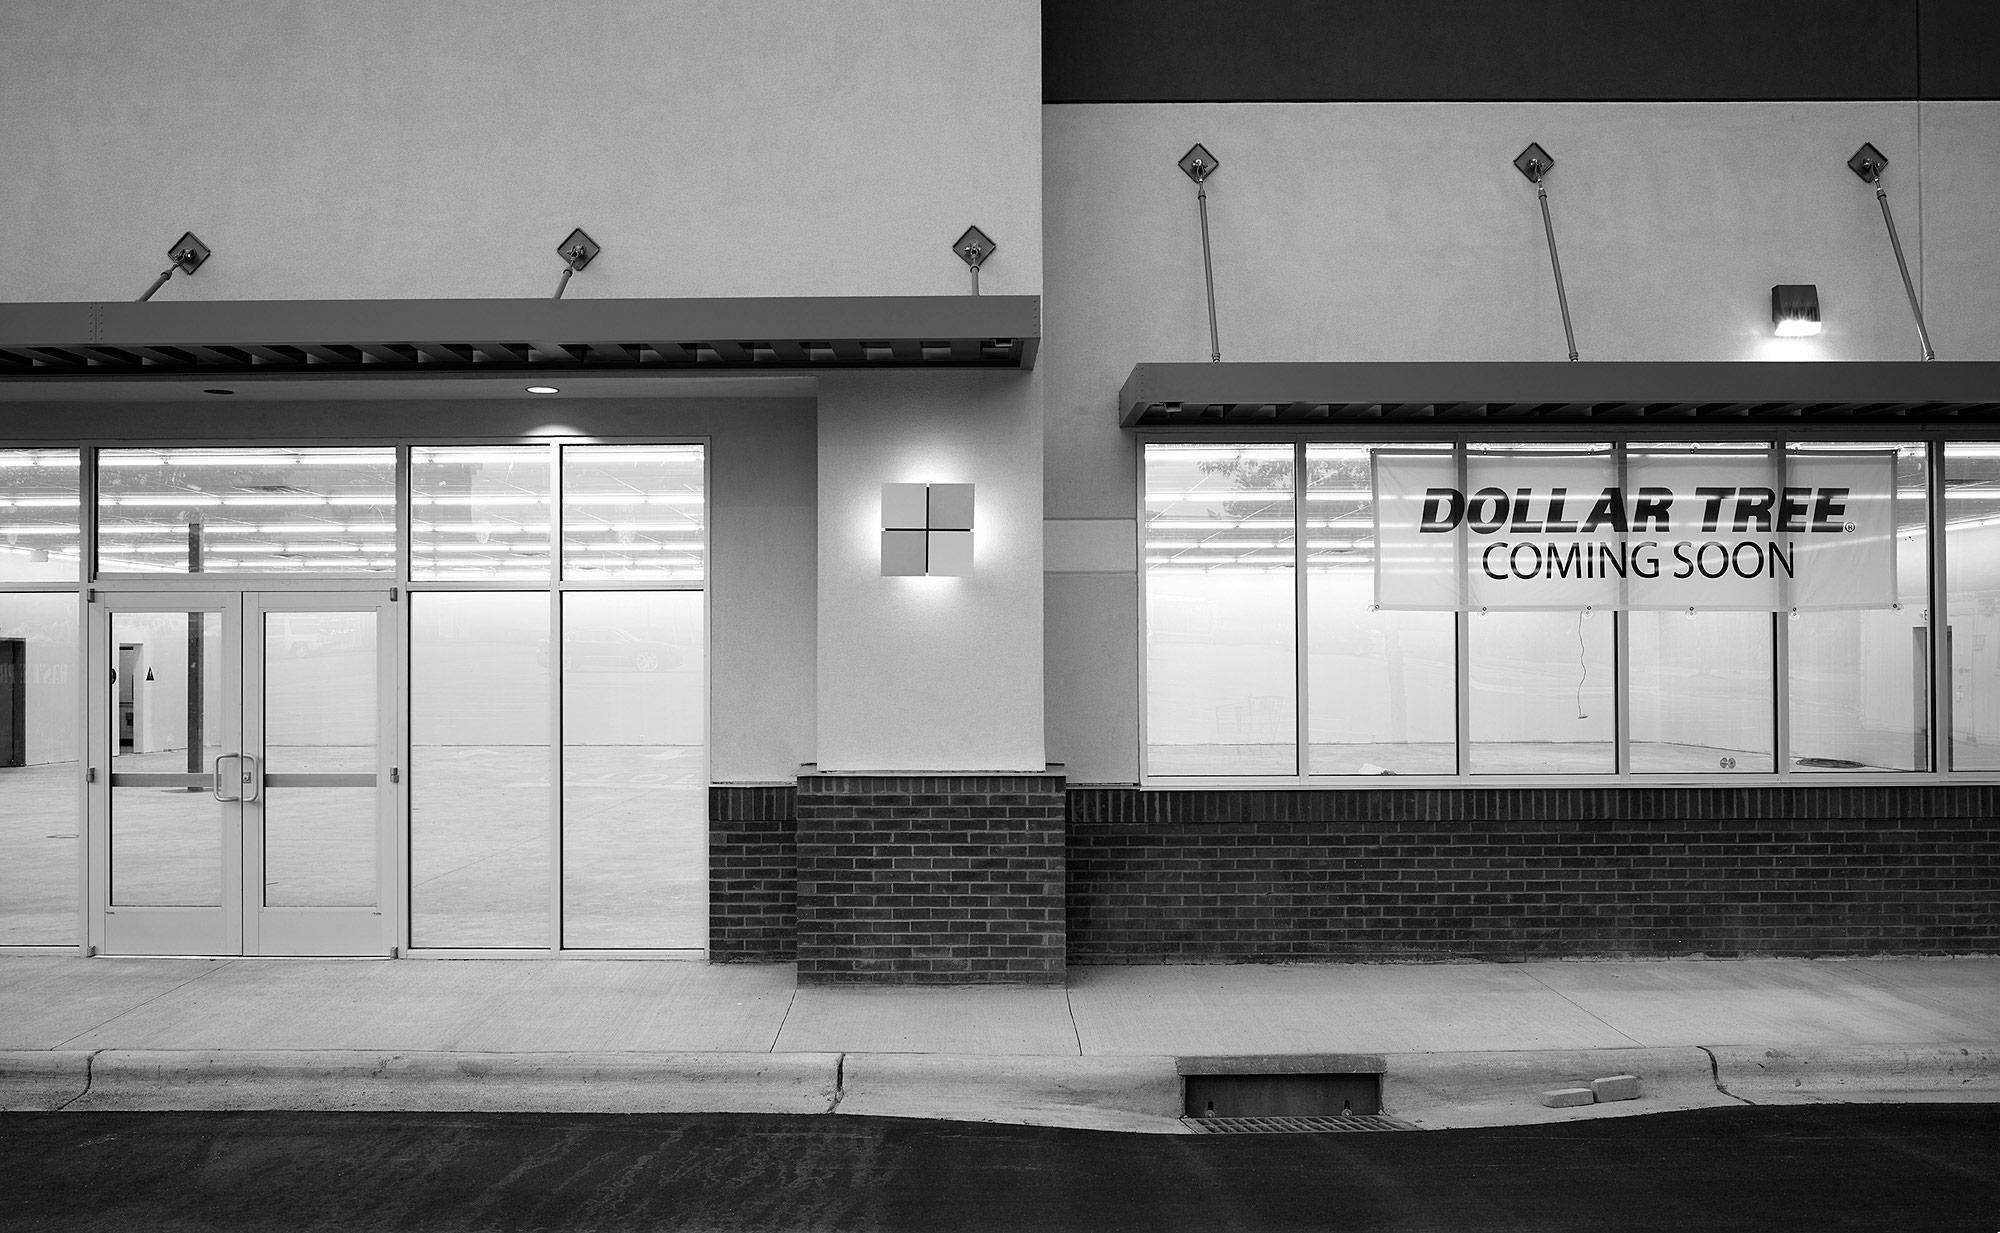 Retail Landscape 2017 — DREW HARTY PHOTOGRAPHY